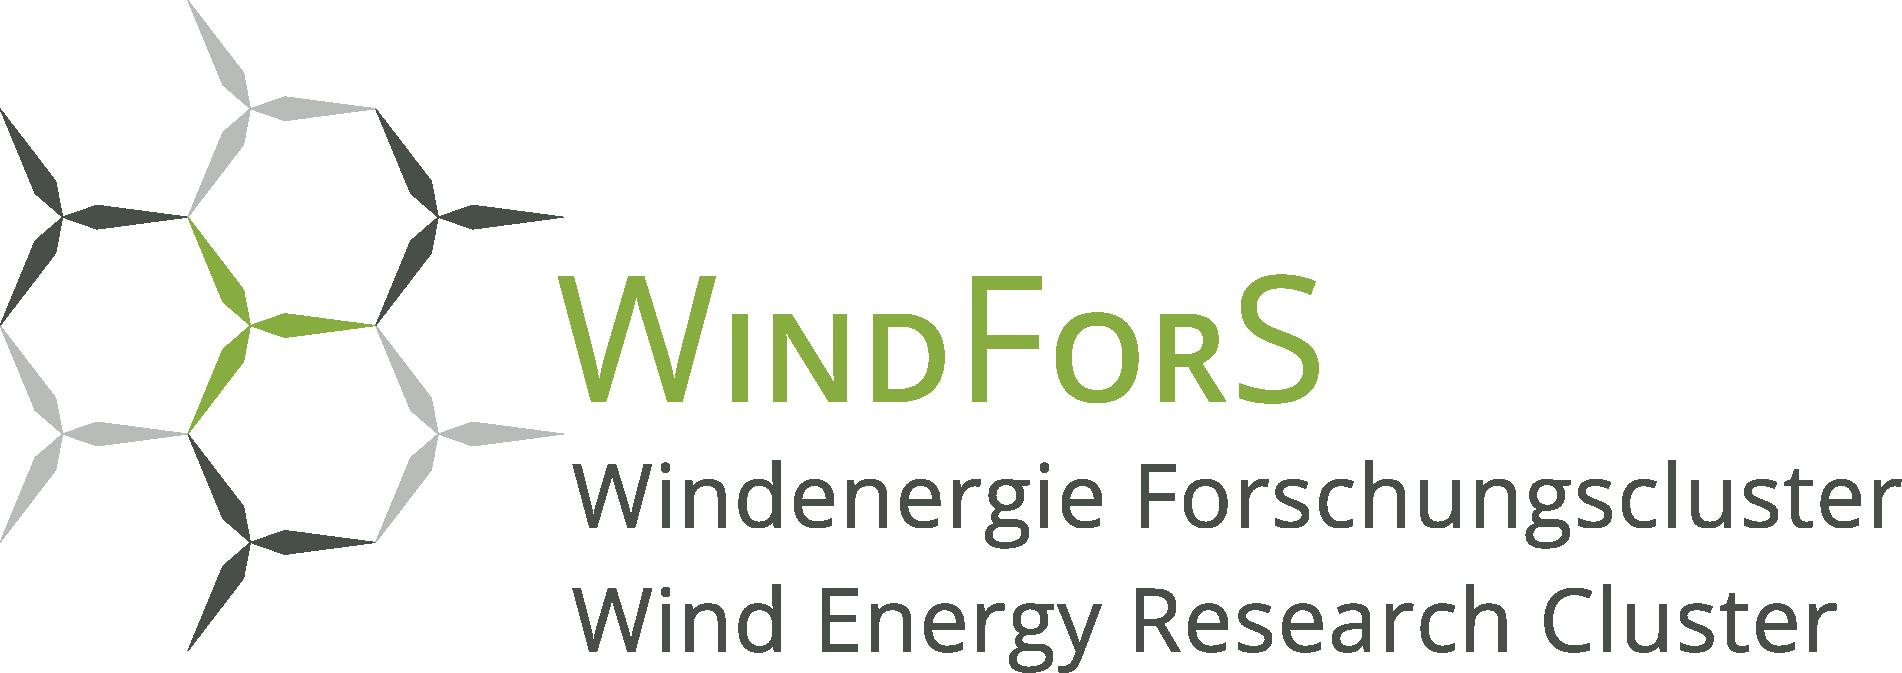 WindForS